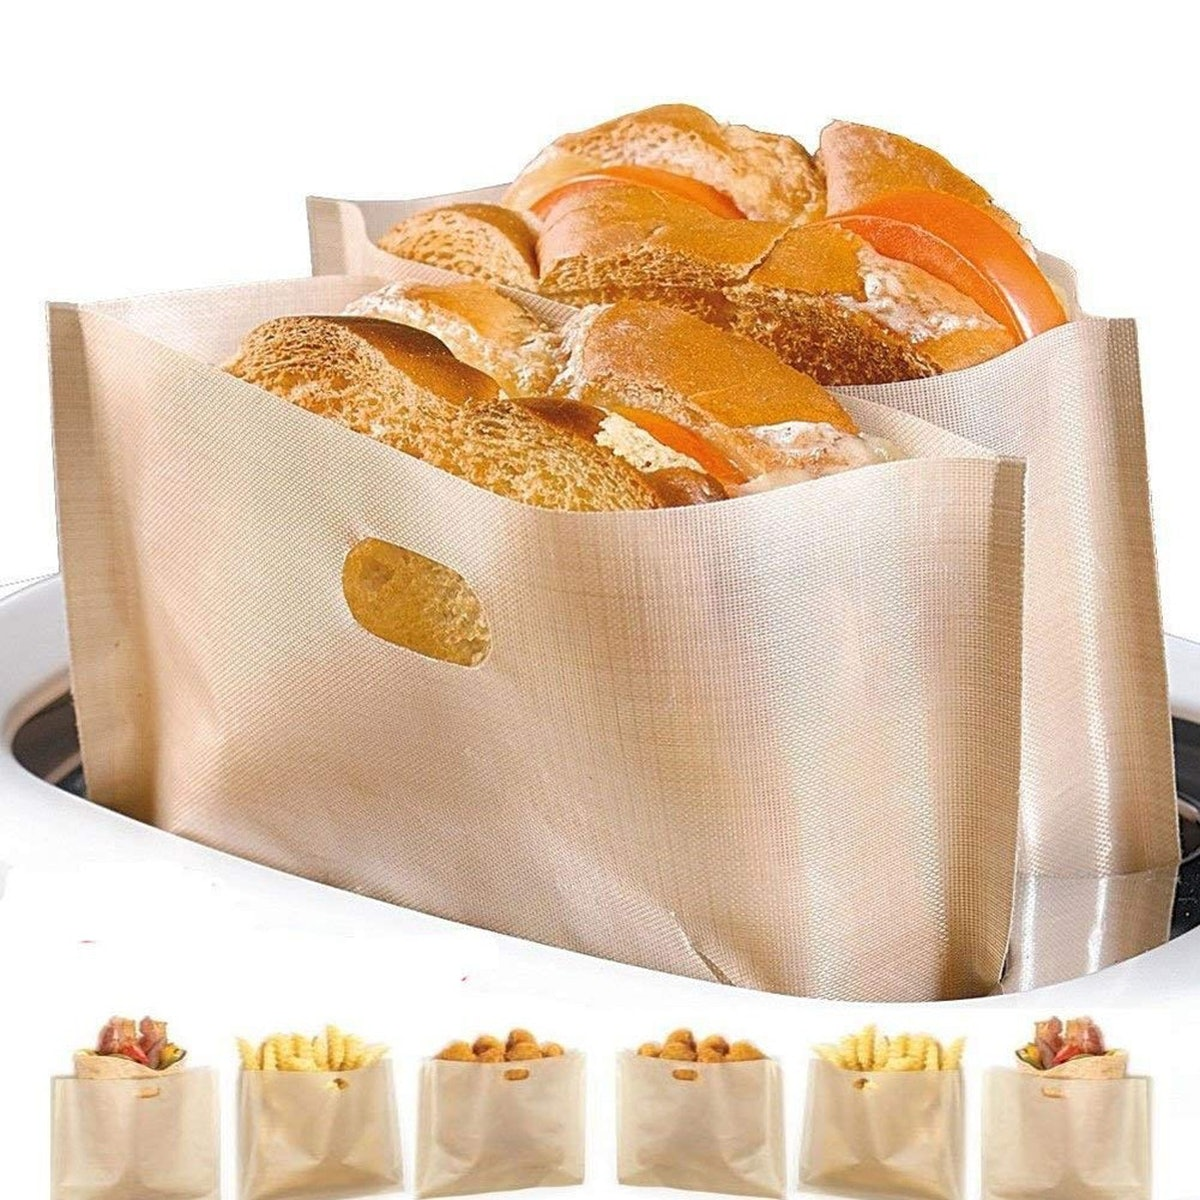 YOOCOOL Reusable Toaster Cooking Bags